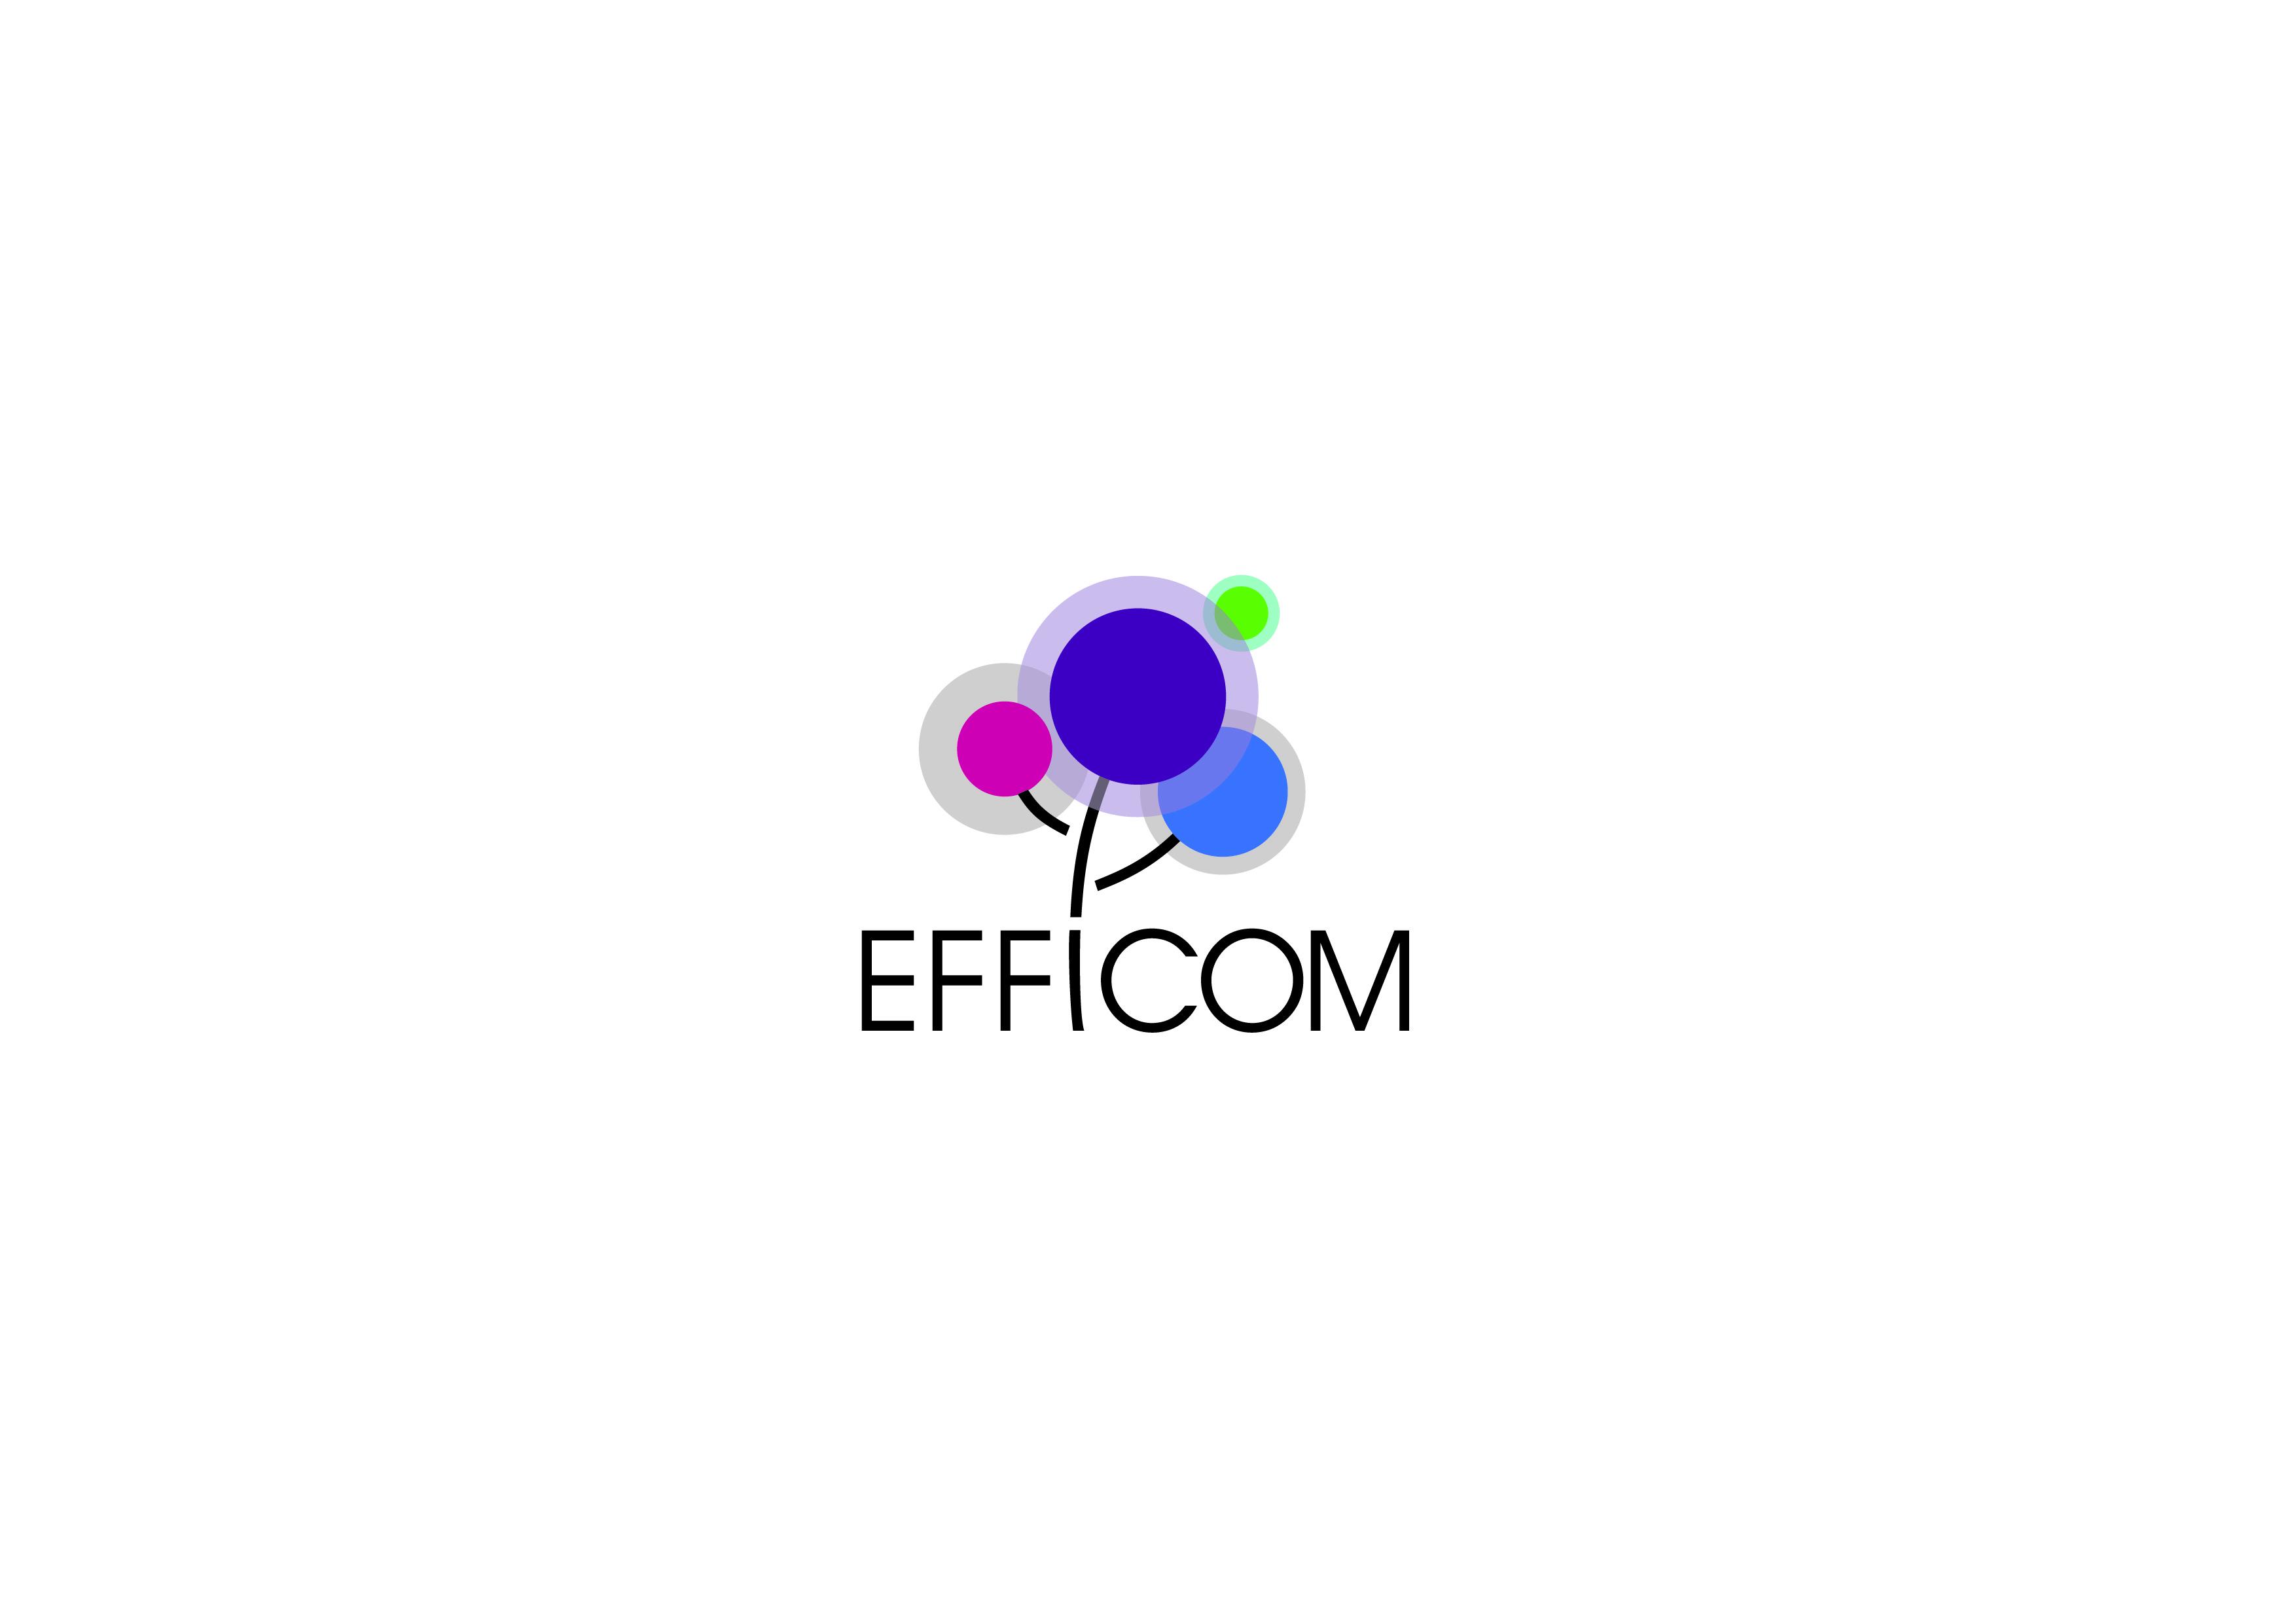 EFFICOM